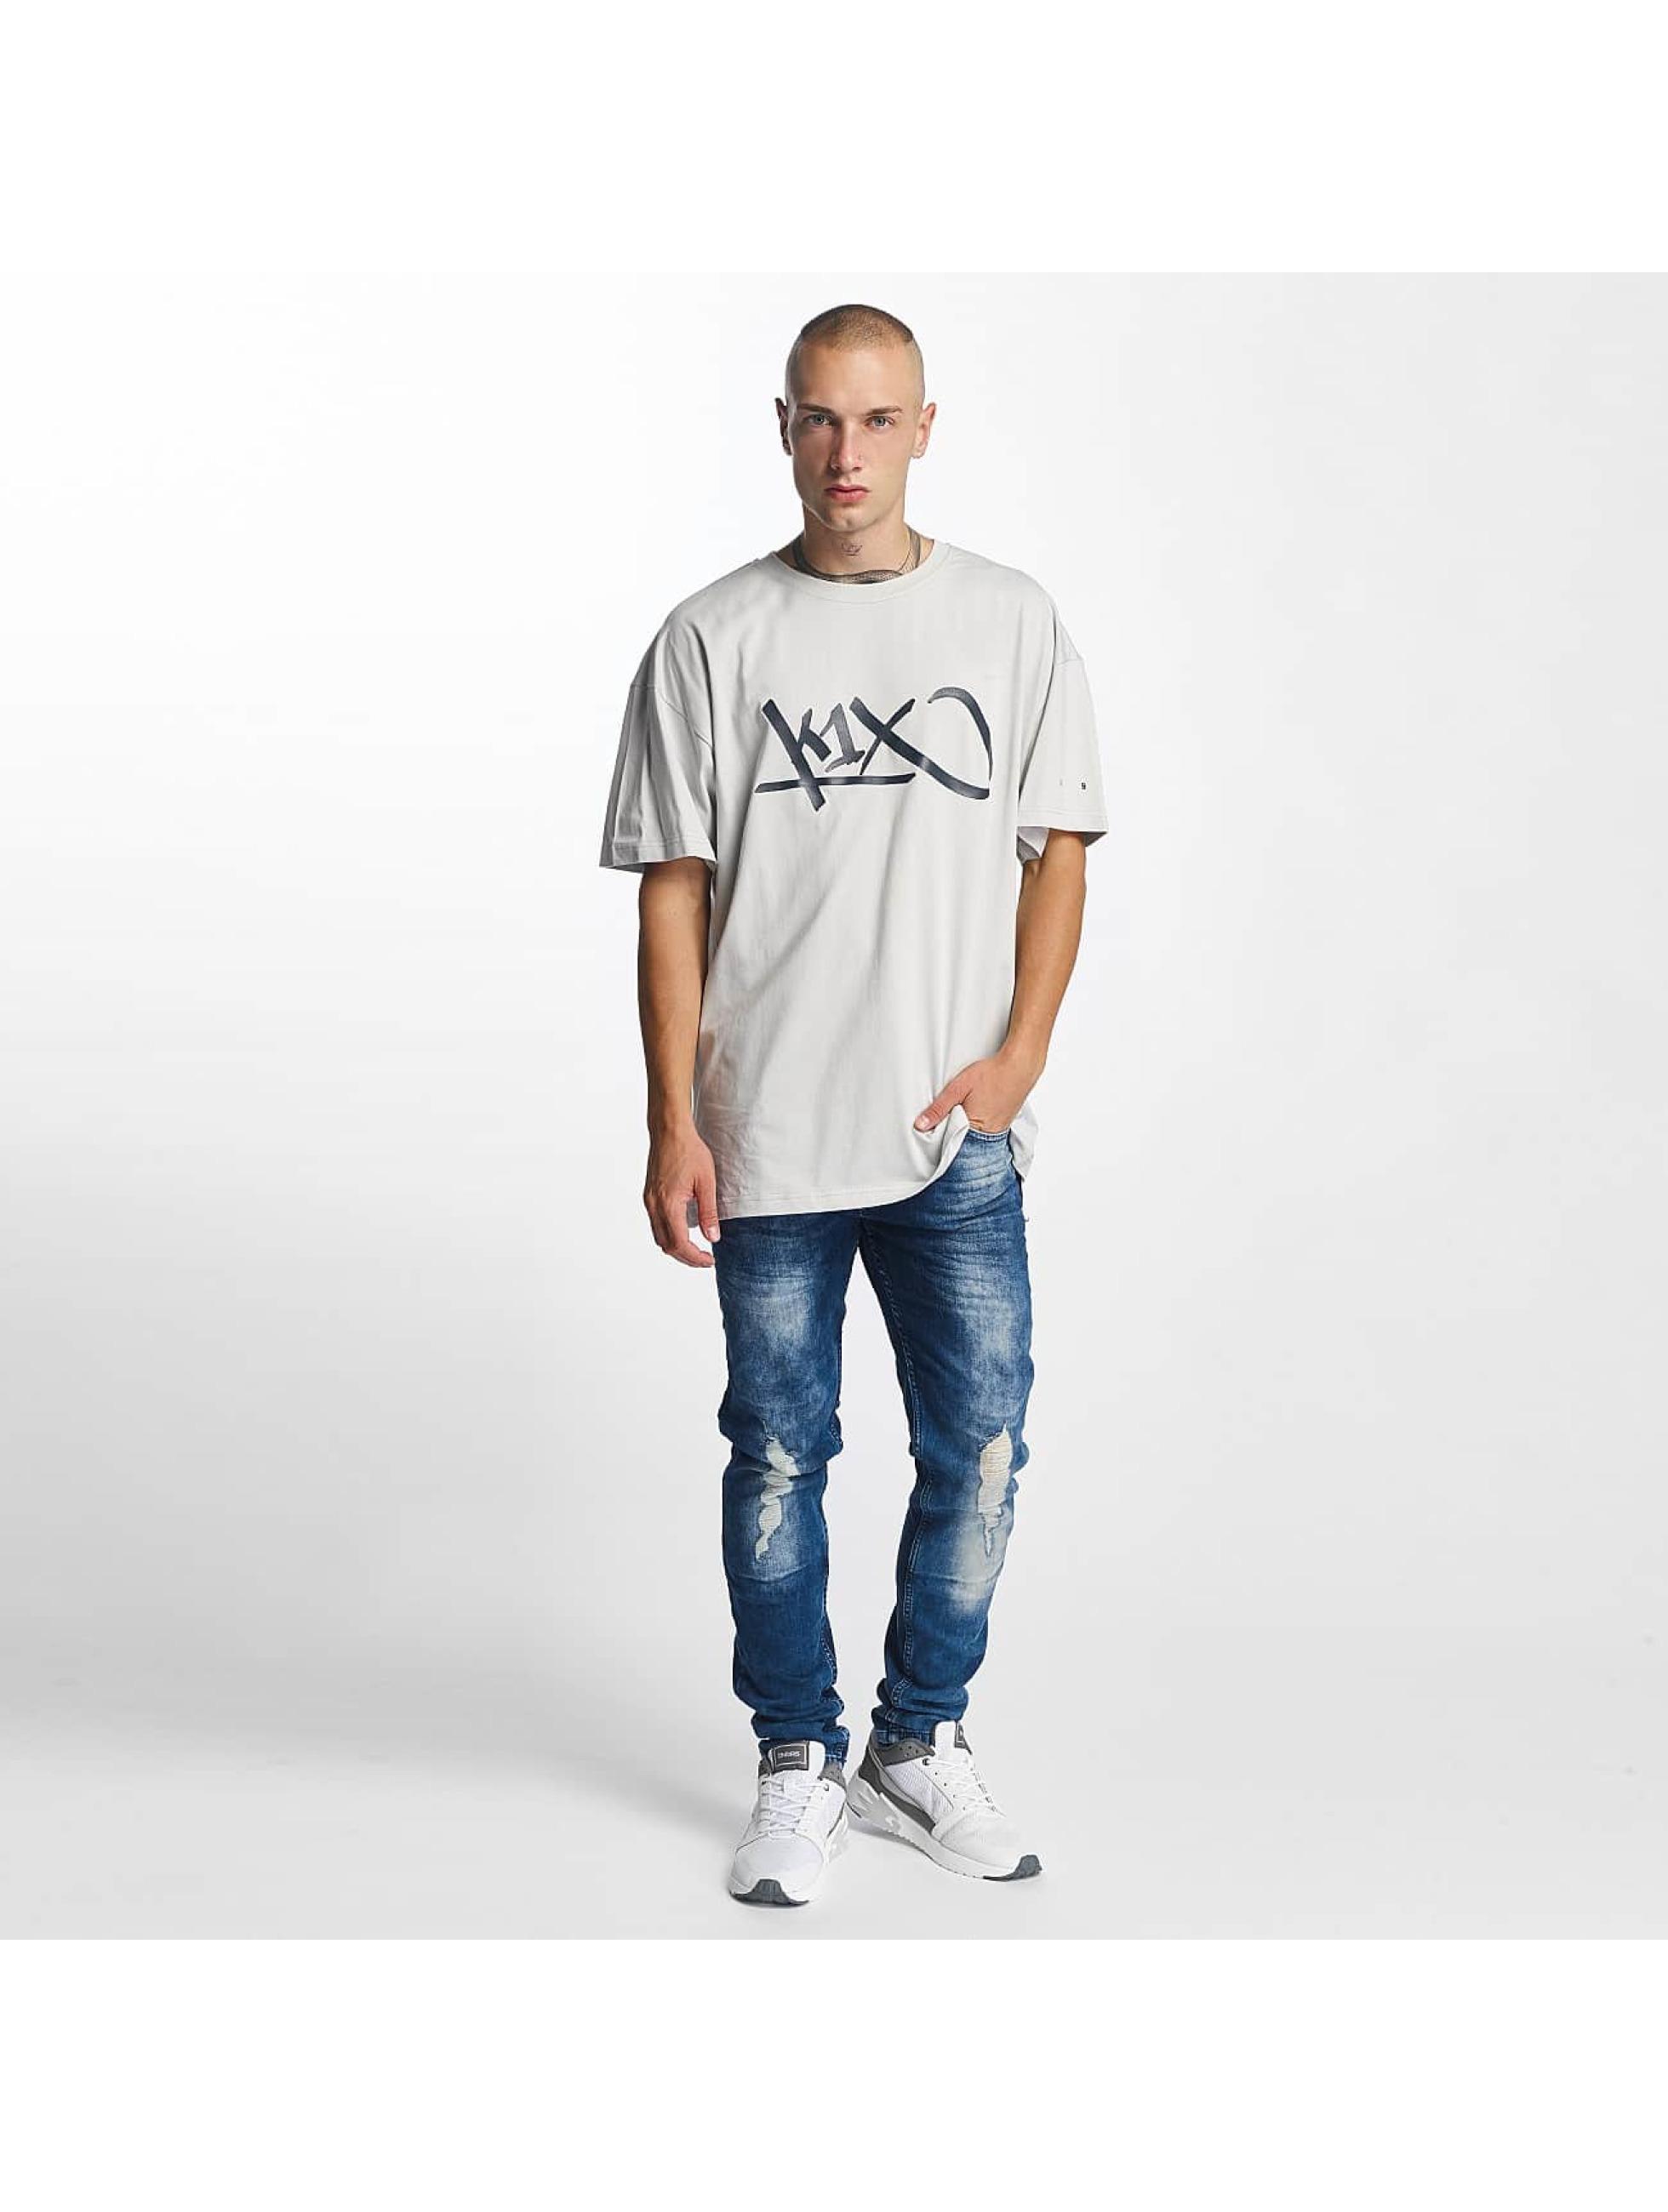 K1X T-Shirt Ivery Sports Tag gray